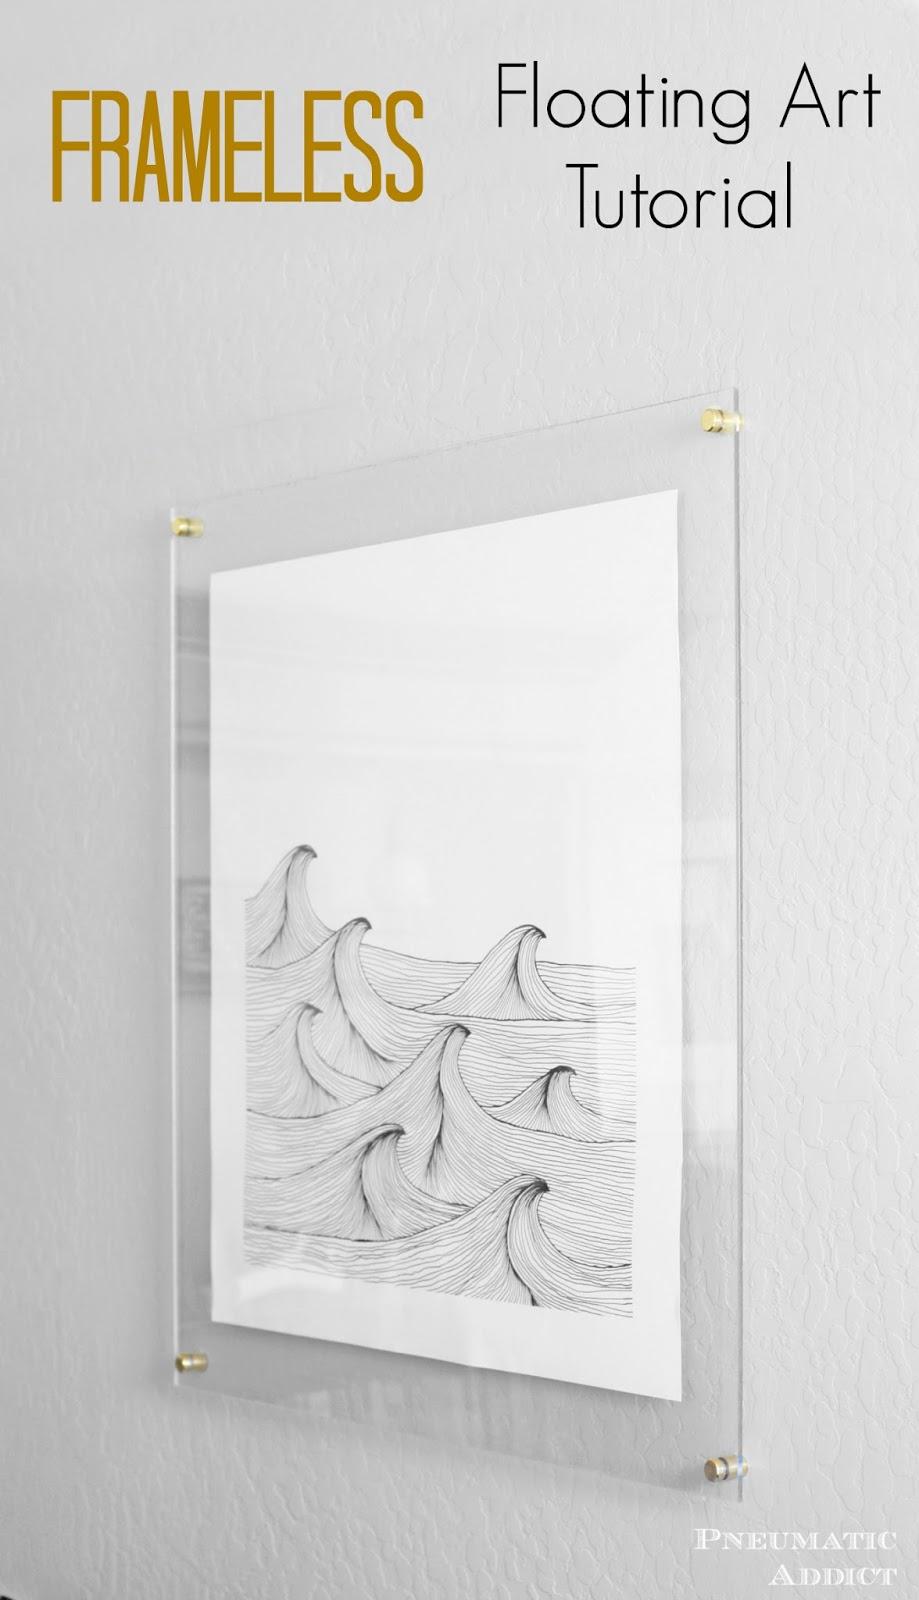 Pneumatic Addict : Frameless Floating Art Tutorial